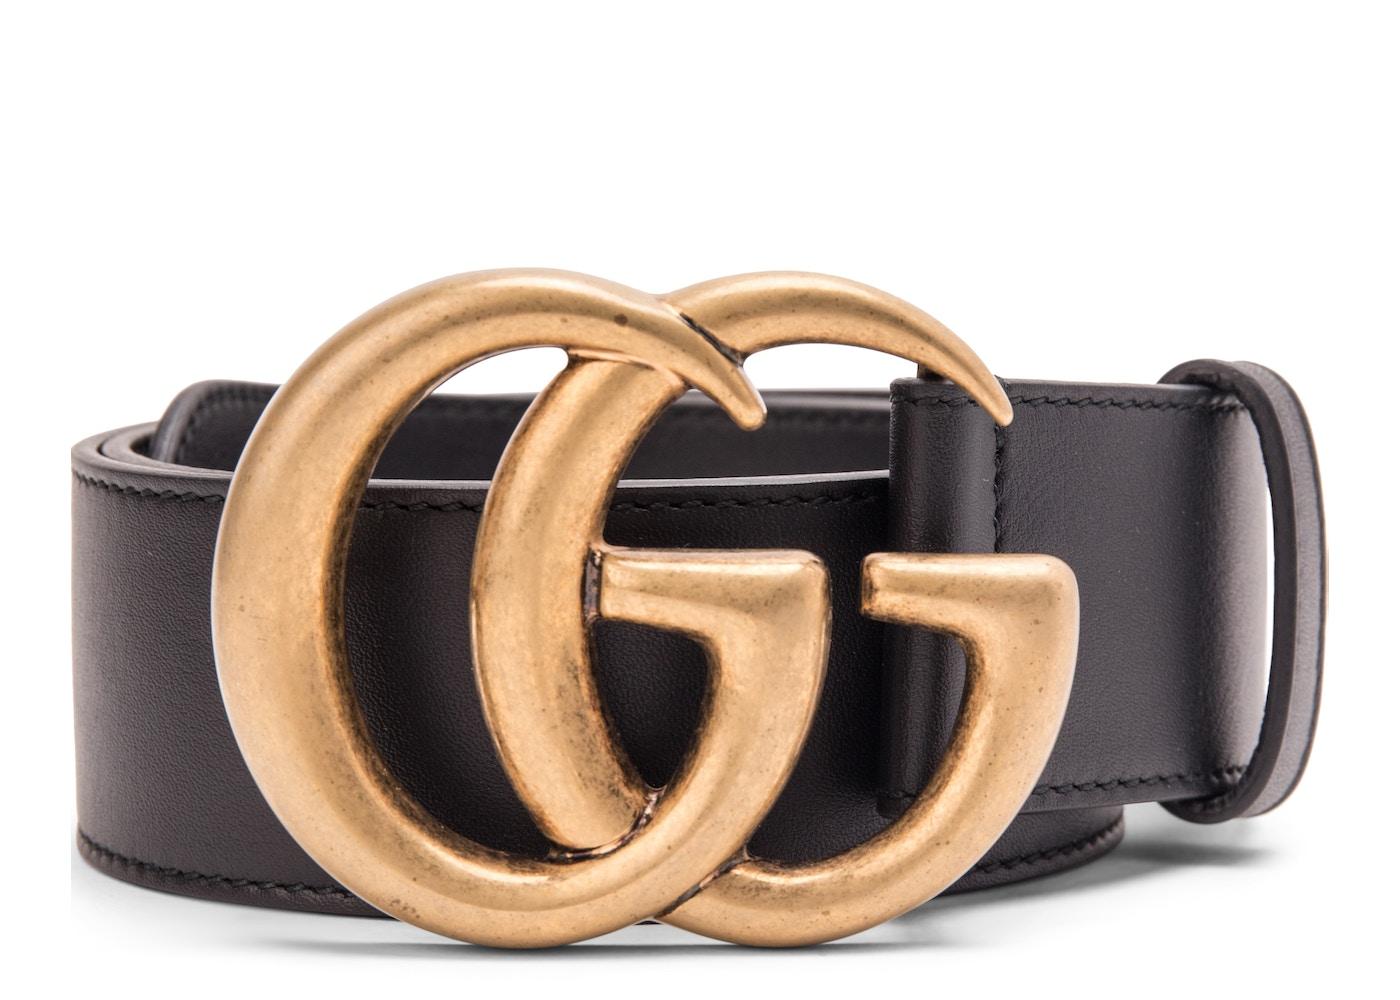 4e14c69bcf229 Gucci Double G Buckle Leather Belt 1.5 Width 70-28 Black. 70-28 Black